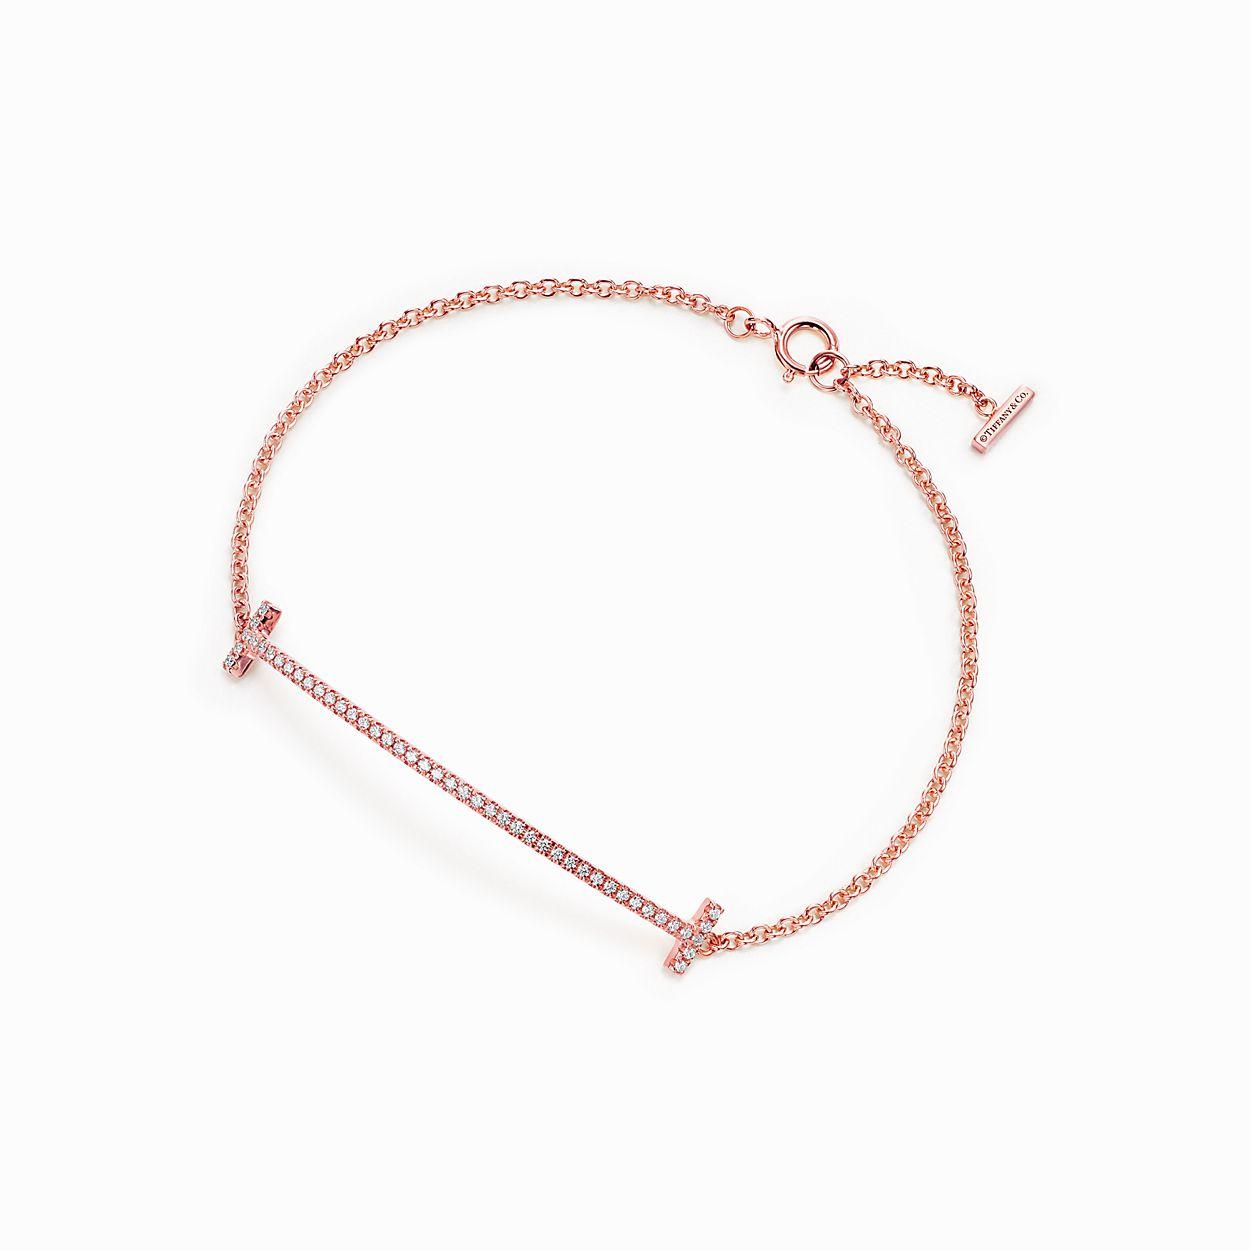 Tiffany T smile earrings in 18k rose gold with diamonds Tiffany & Co. OE9796